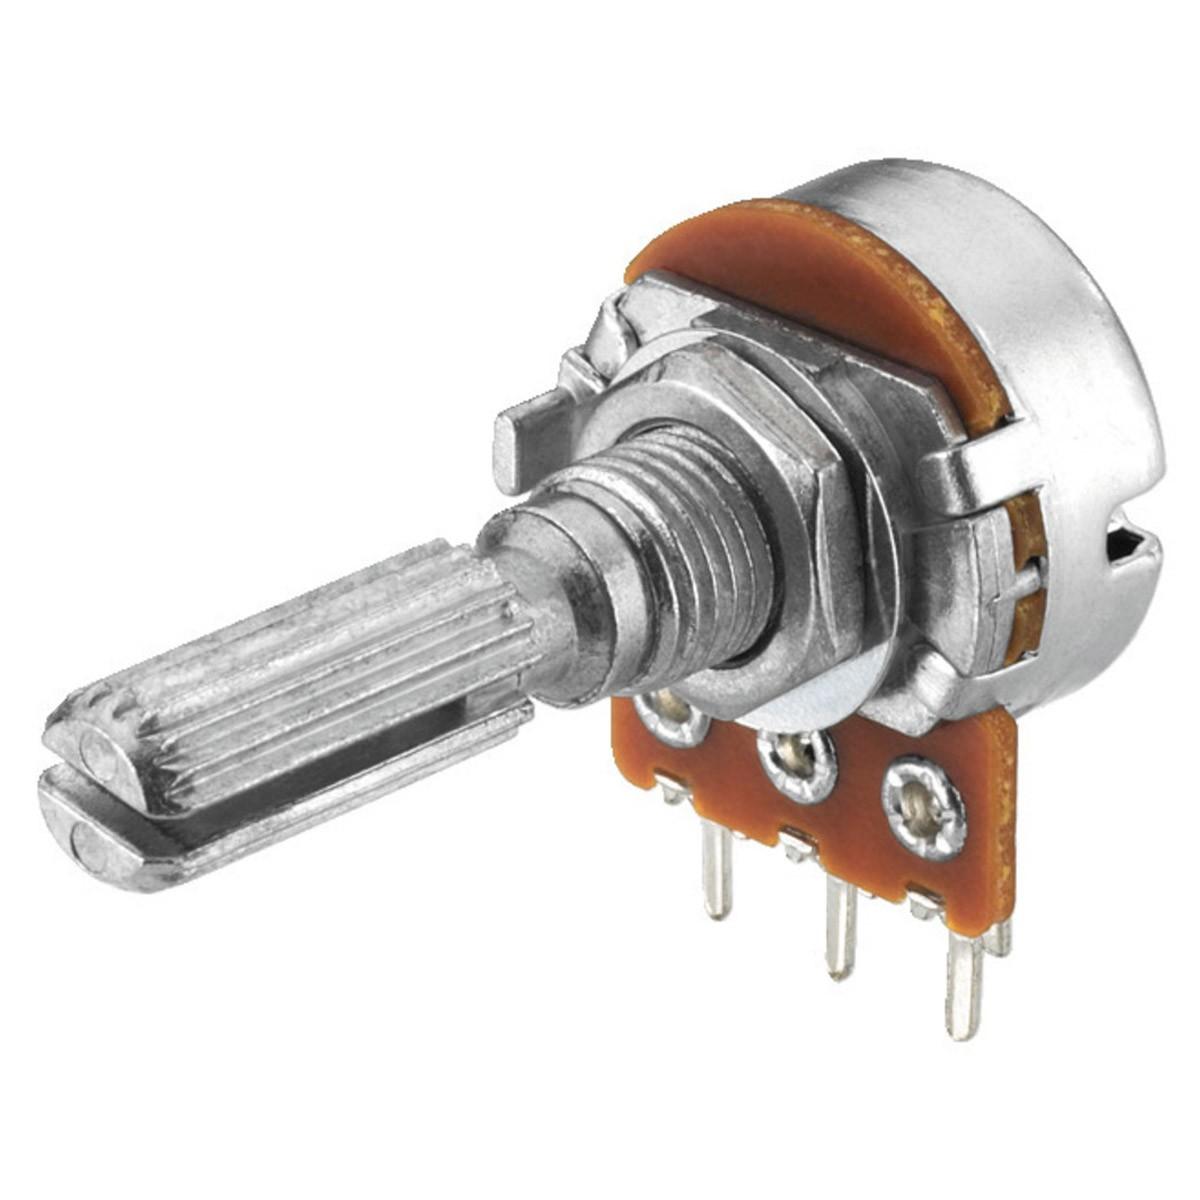 Mono VRB-101M10 Potentiometer 10kohm center point